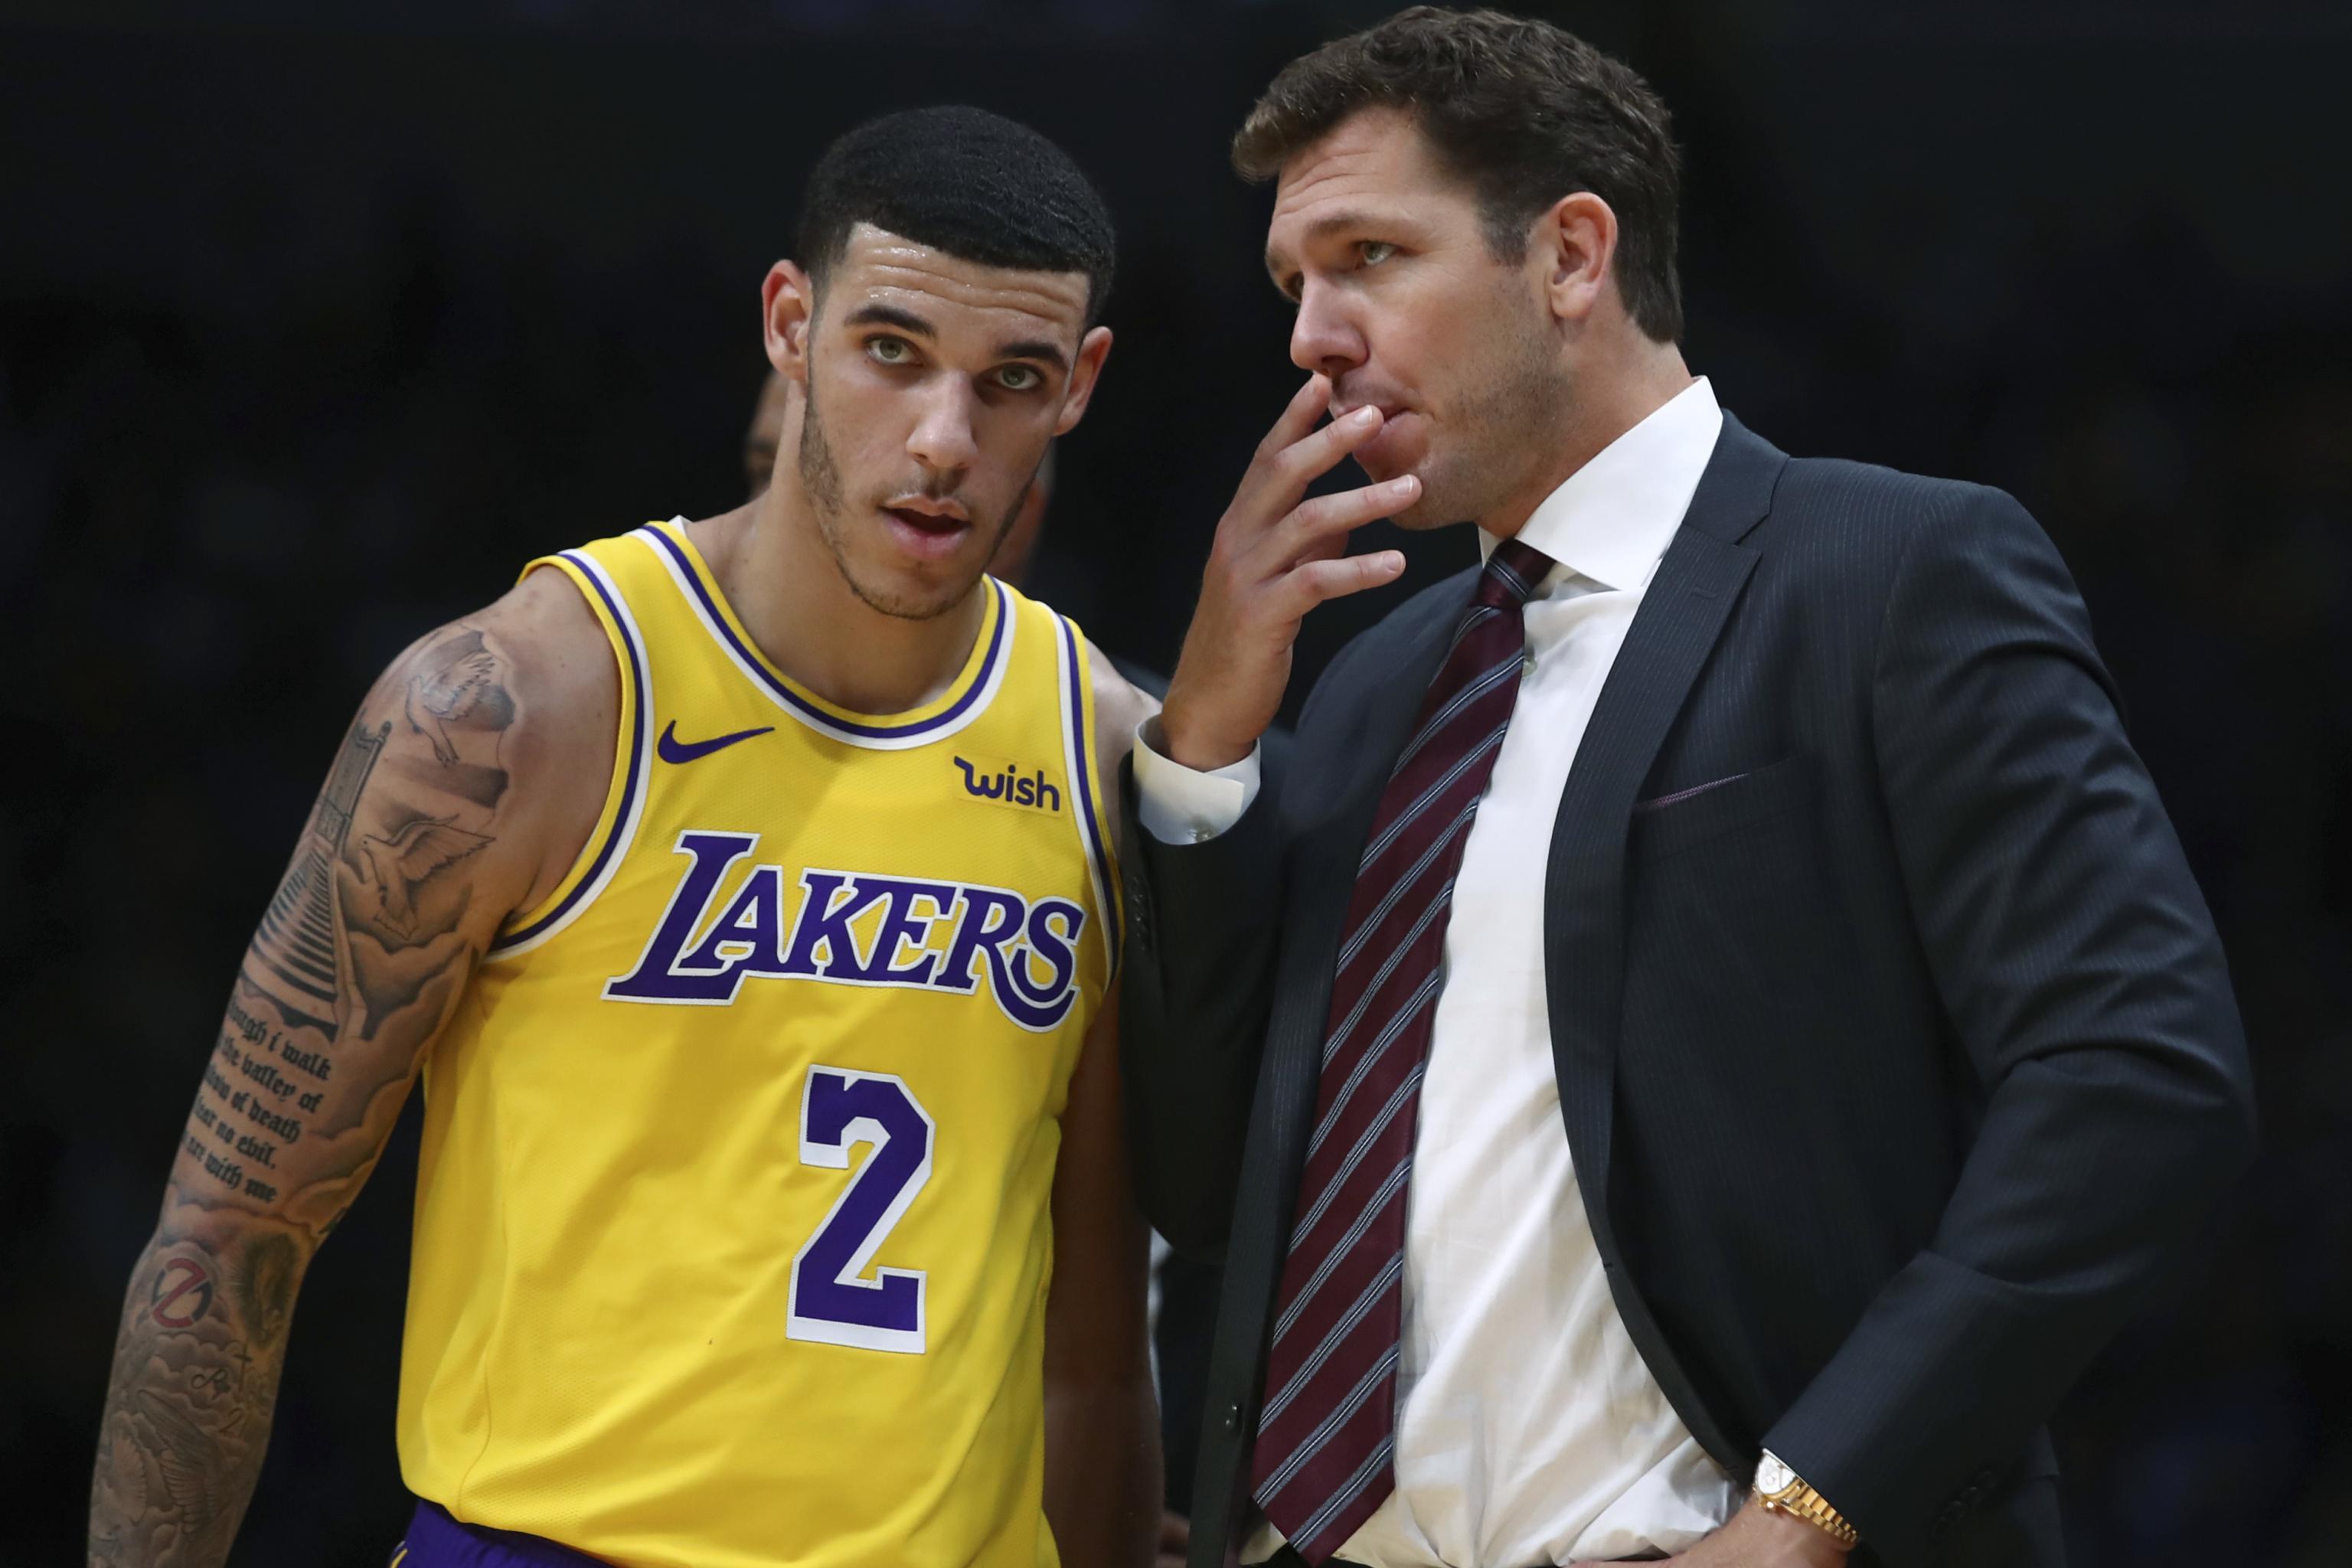 854f67fbec0 Lakers News: Luke Walton, Lonzo Ball Speak on Team's Collapse vs. Clippers